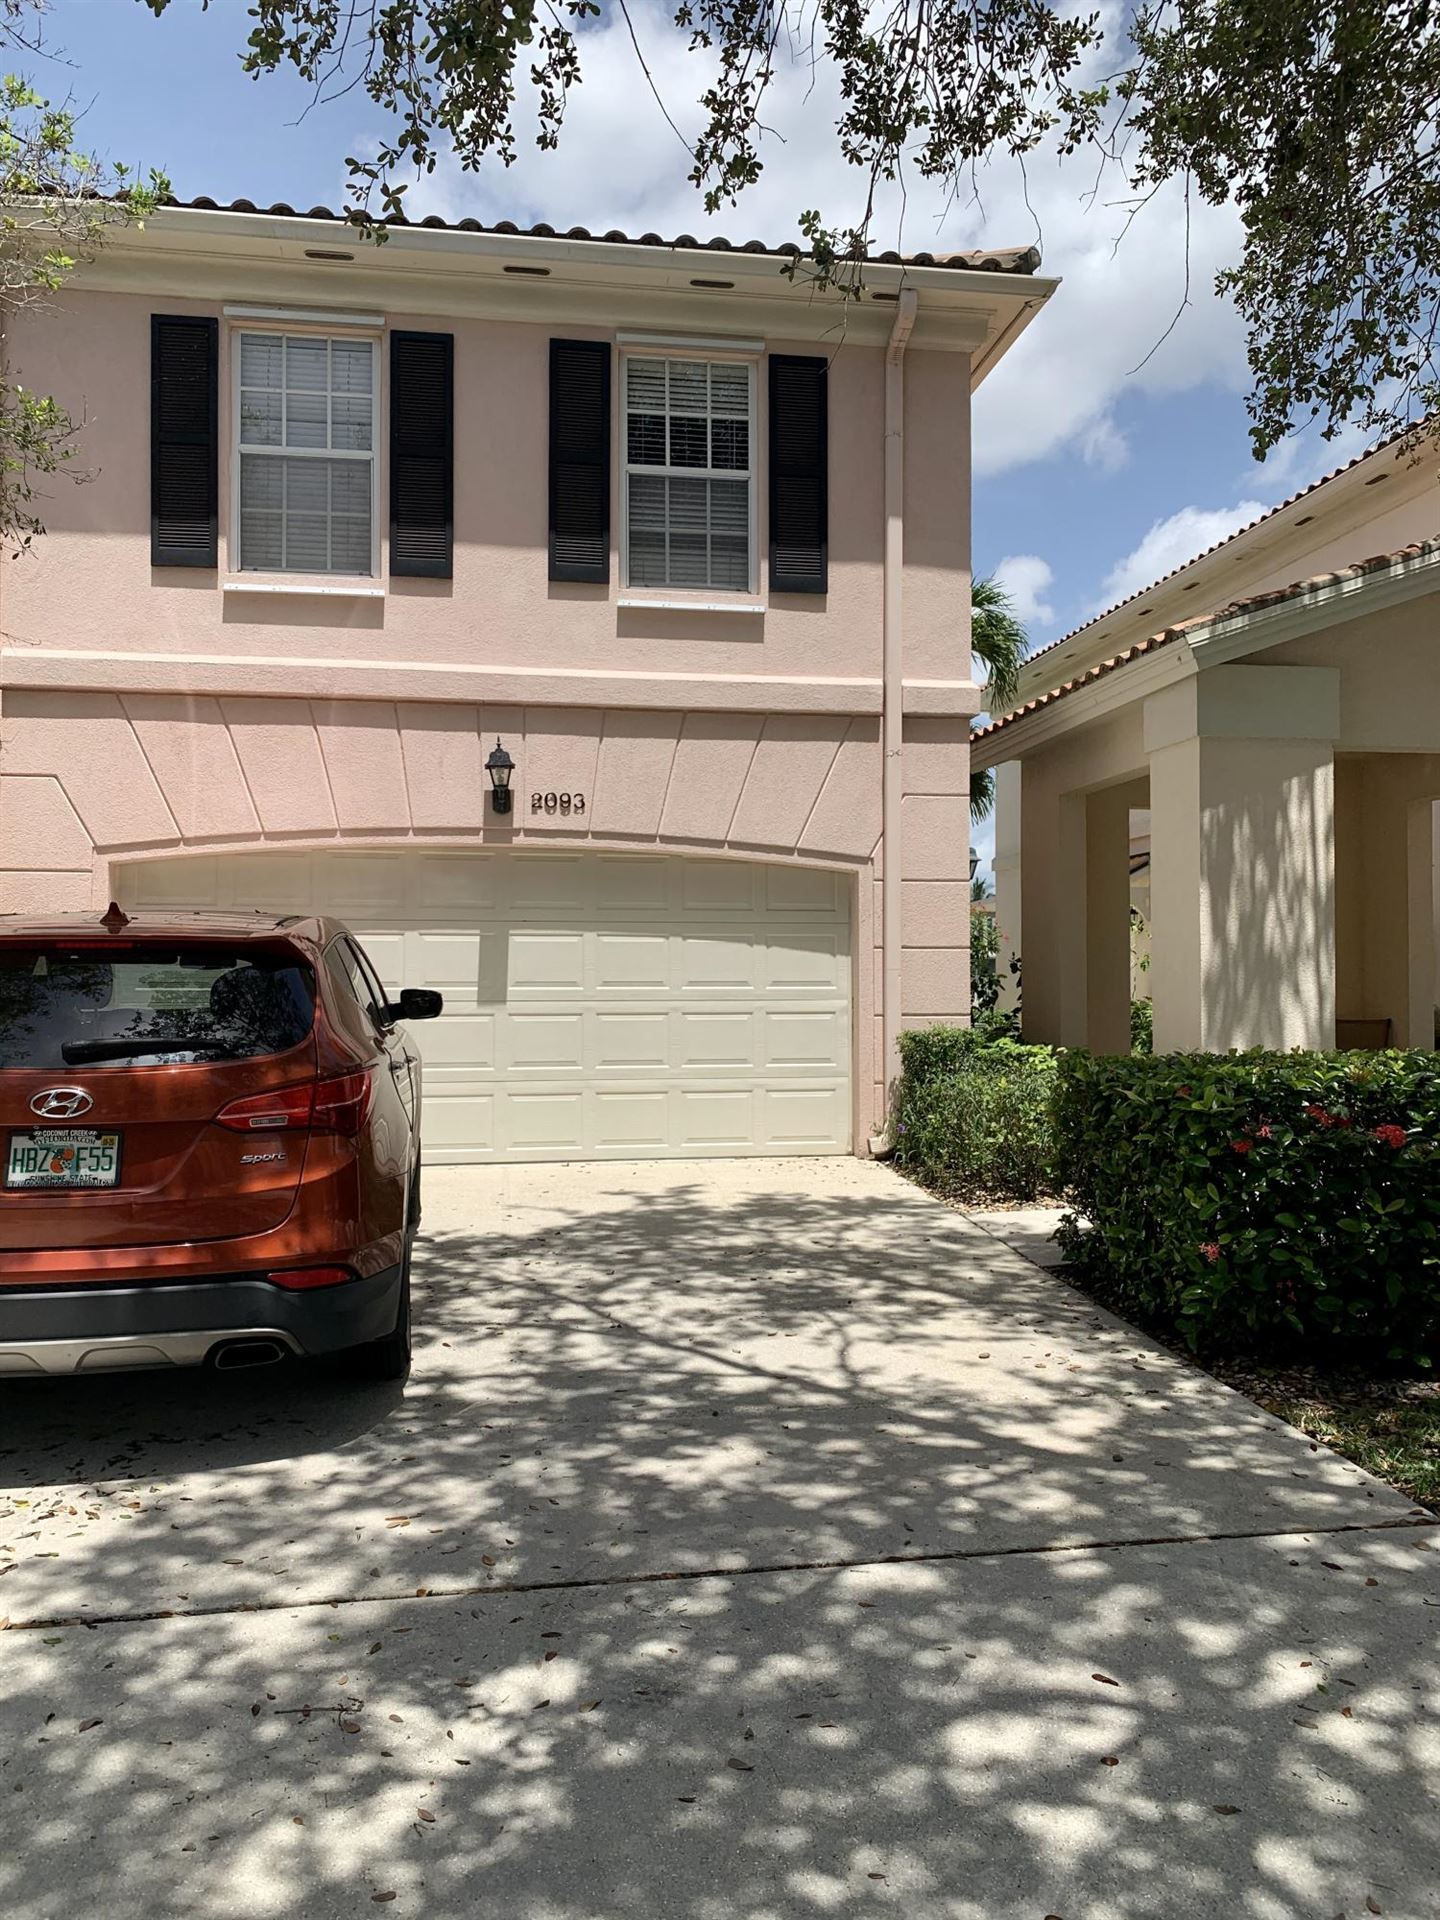 Photo of 2093 Tarpon Lake Way, West Palm Beach, FL 33411 (MLS # RX-10635751)